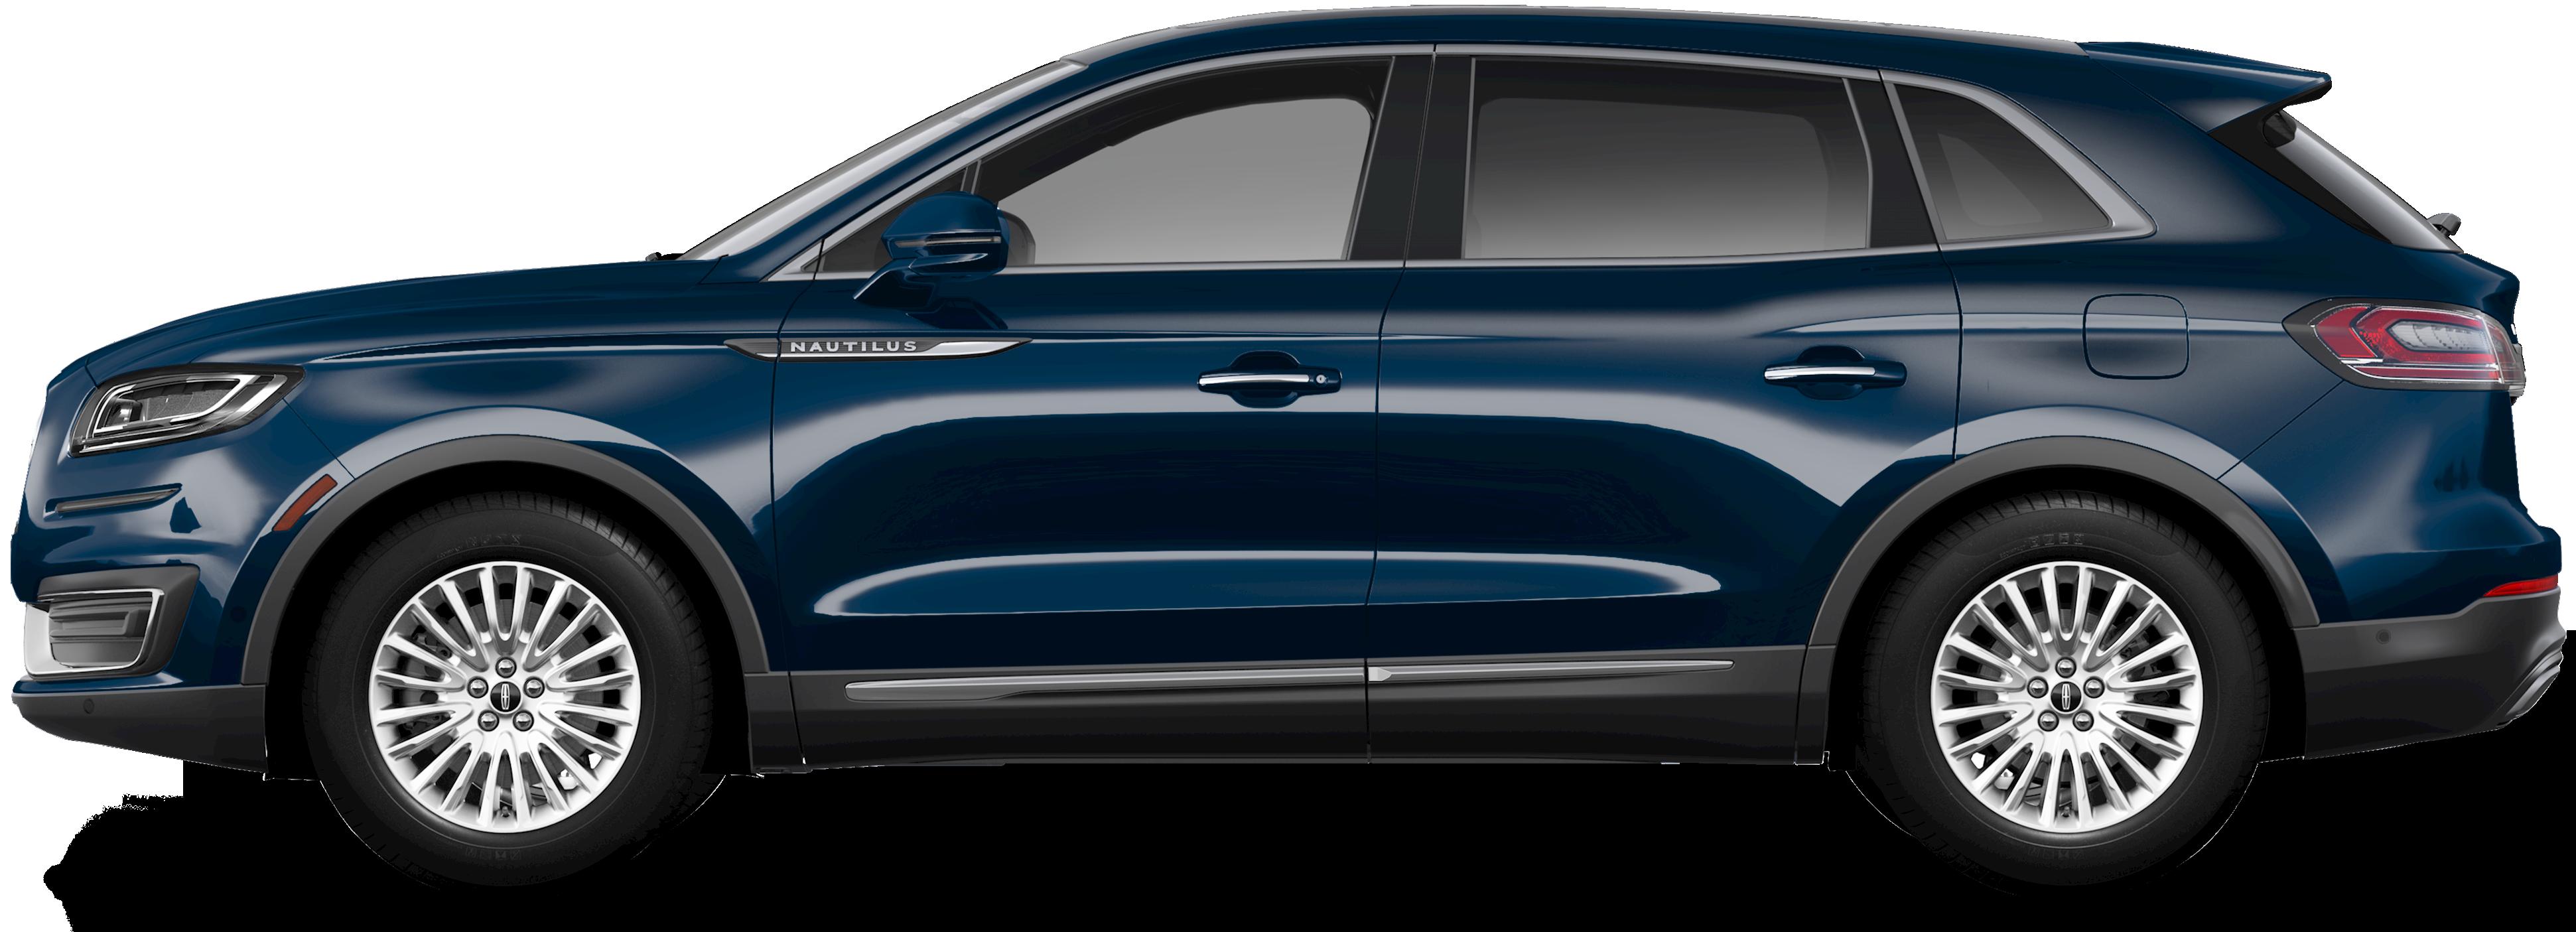 2020 Lincoln Nautilus SUV Standard